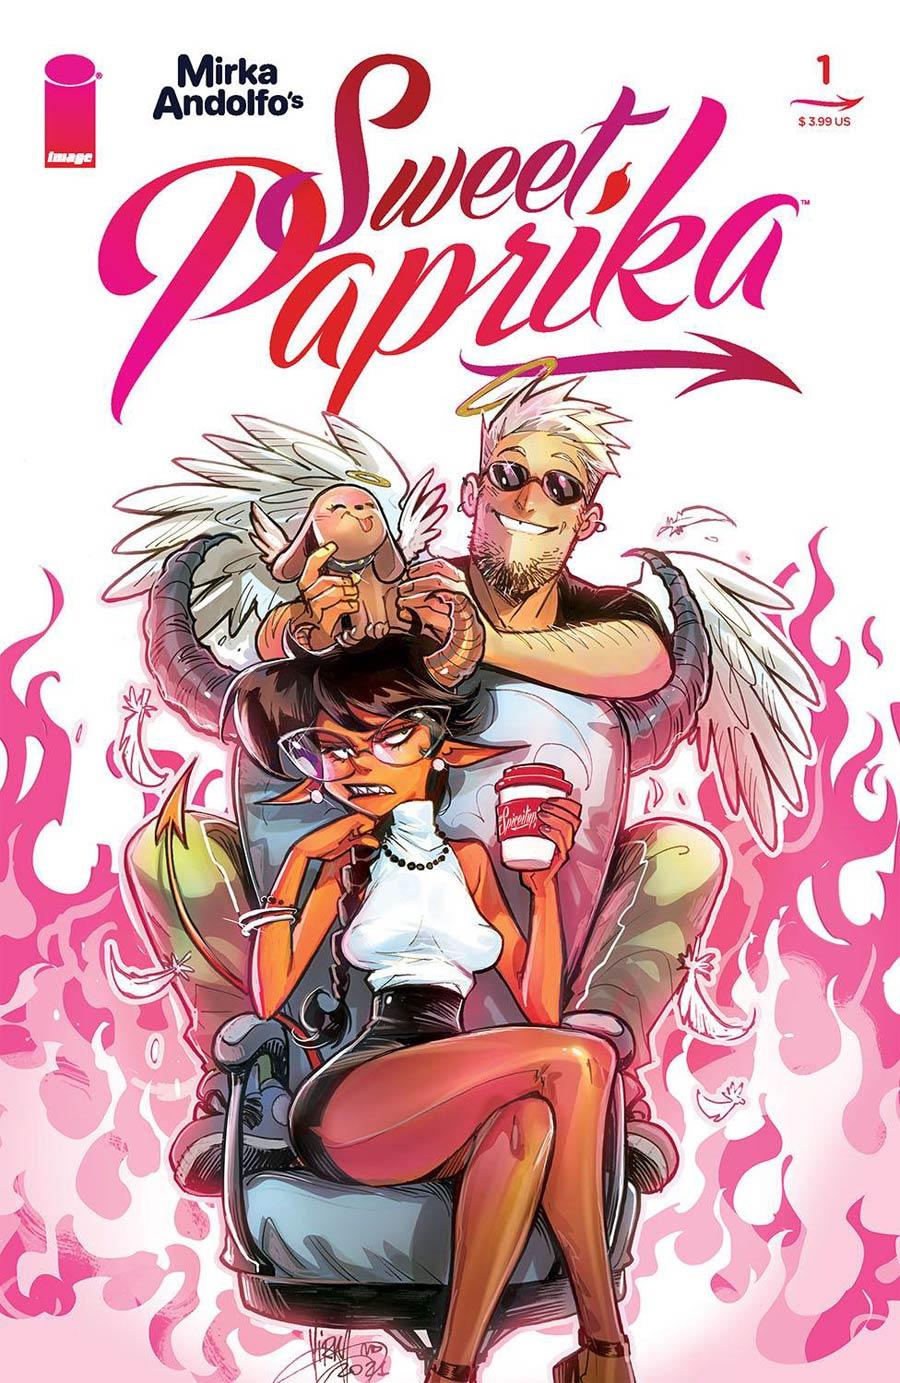 Mirka Andolfos Sweet Paprika #1 Cover A Regular Mirka Andolfo Cover